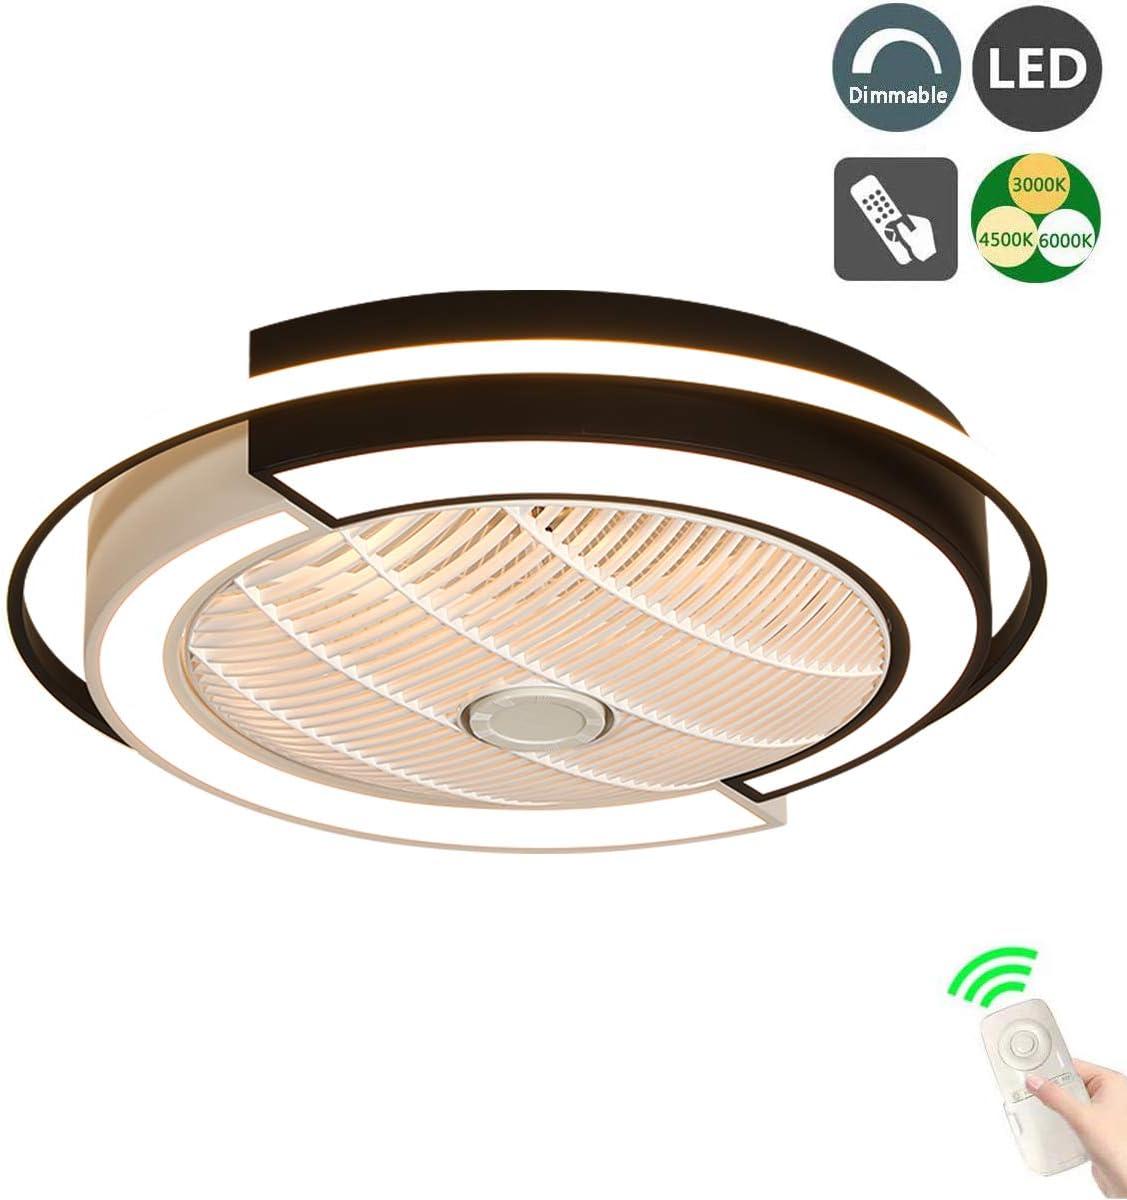 Ventilador de Techo LED, Silencioso Ventilador de Techo Con luz y mando a distancia, 3 Velocidades, 1/2/4 H Temporizador, 36W, Φ53 * H20cm, Regulable Luz de Techo para Habitacion Cocina